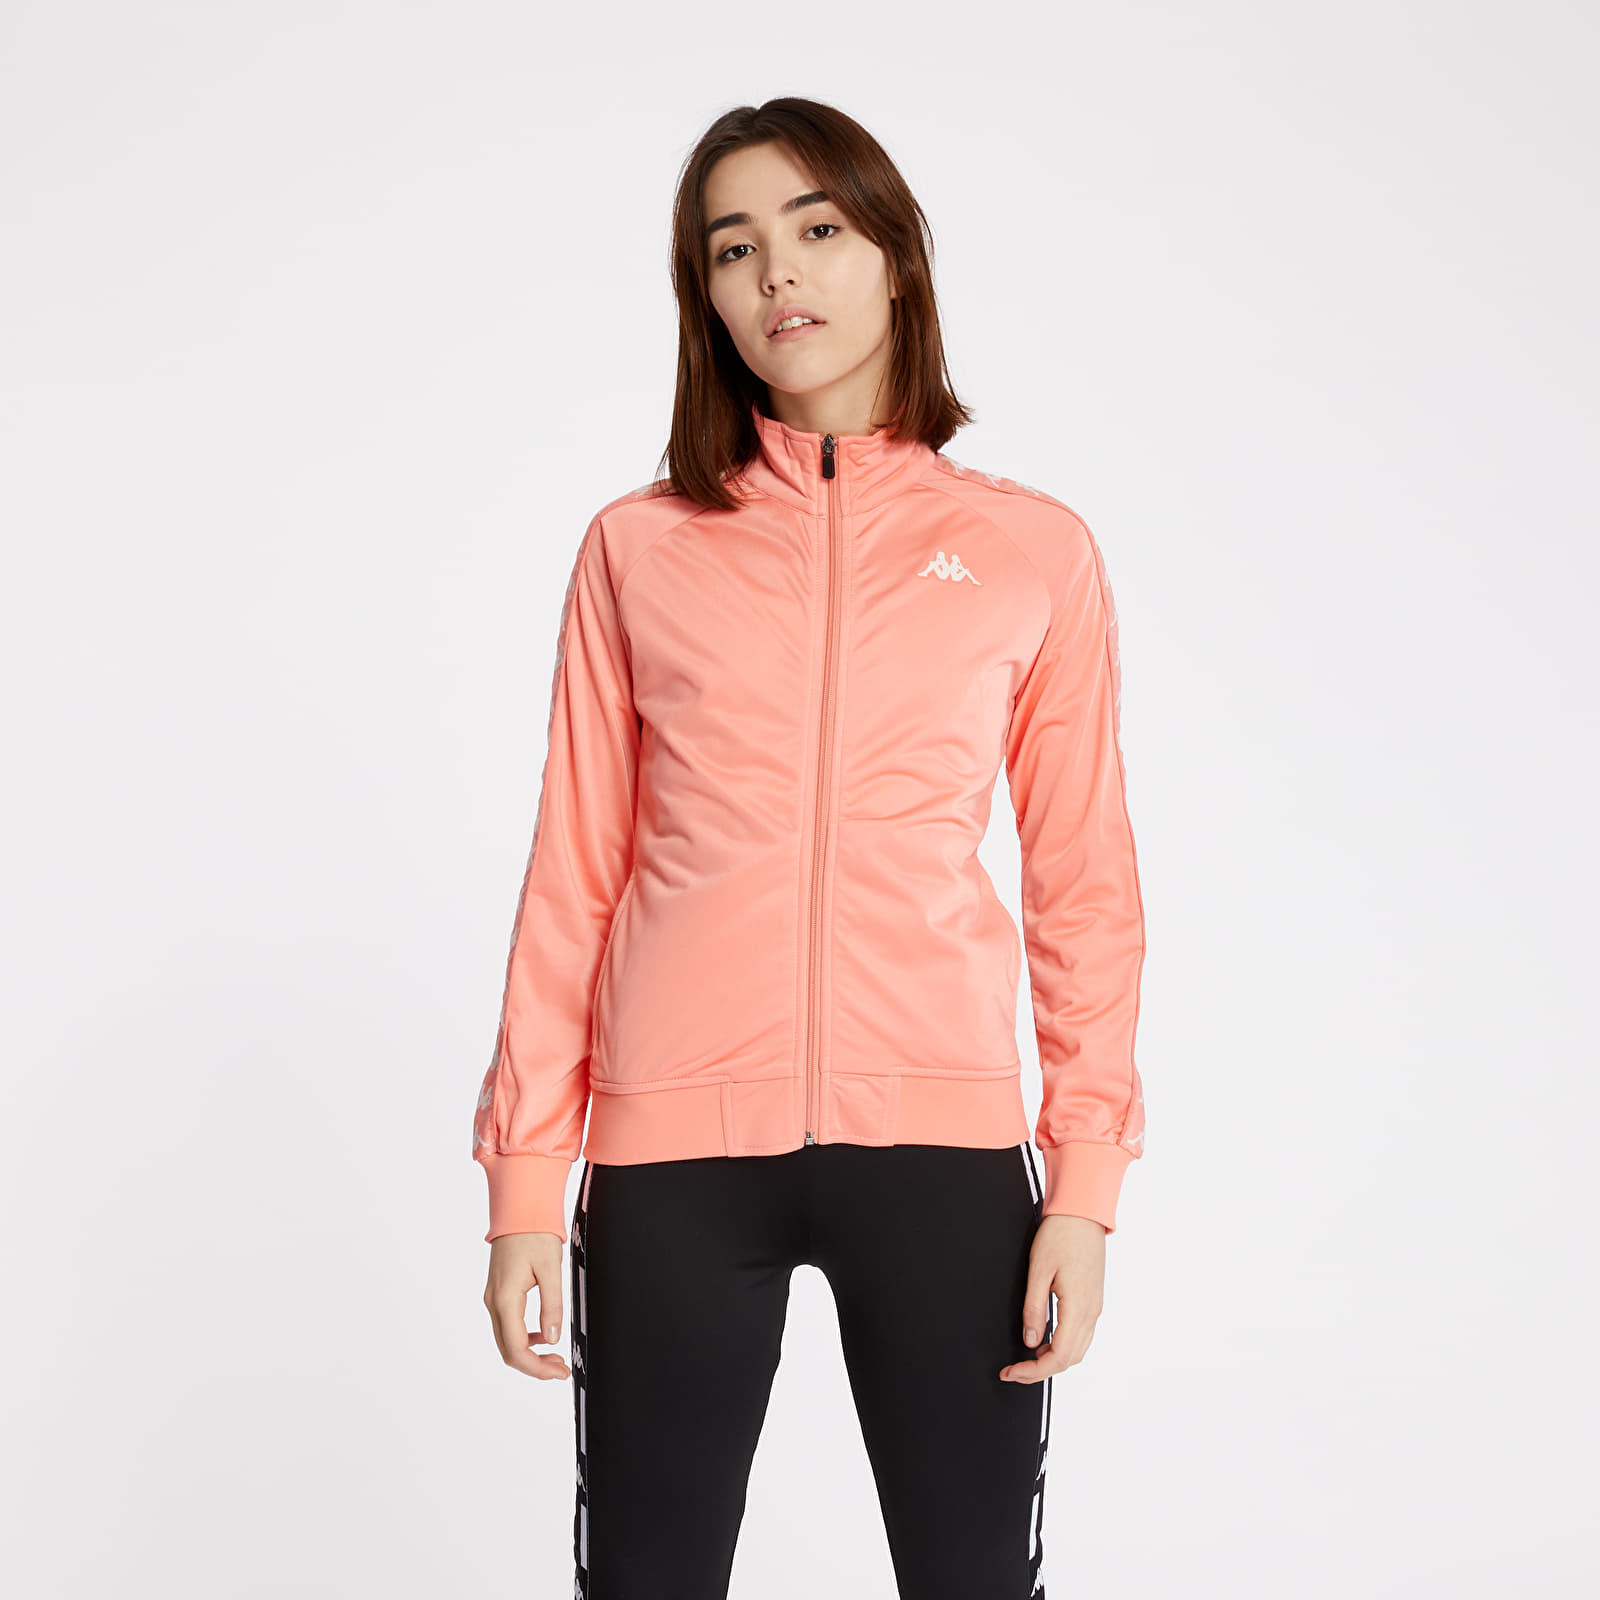 Mikiny a svetry Kappa 222 Banda Wanniston Slim Track Jacket Pink/ White